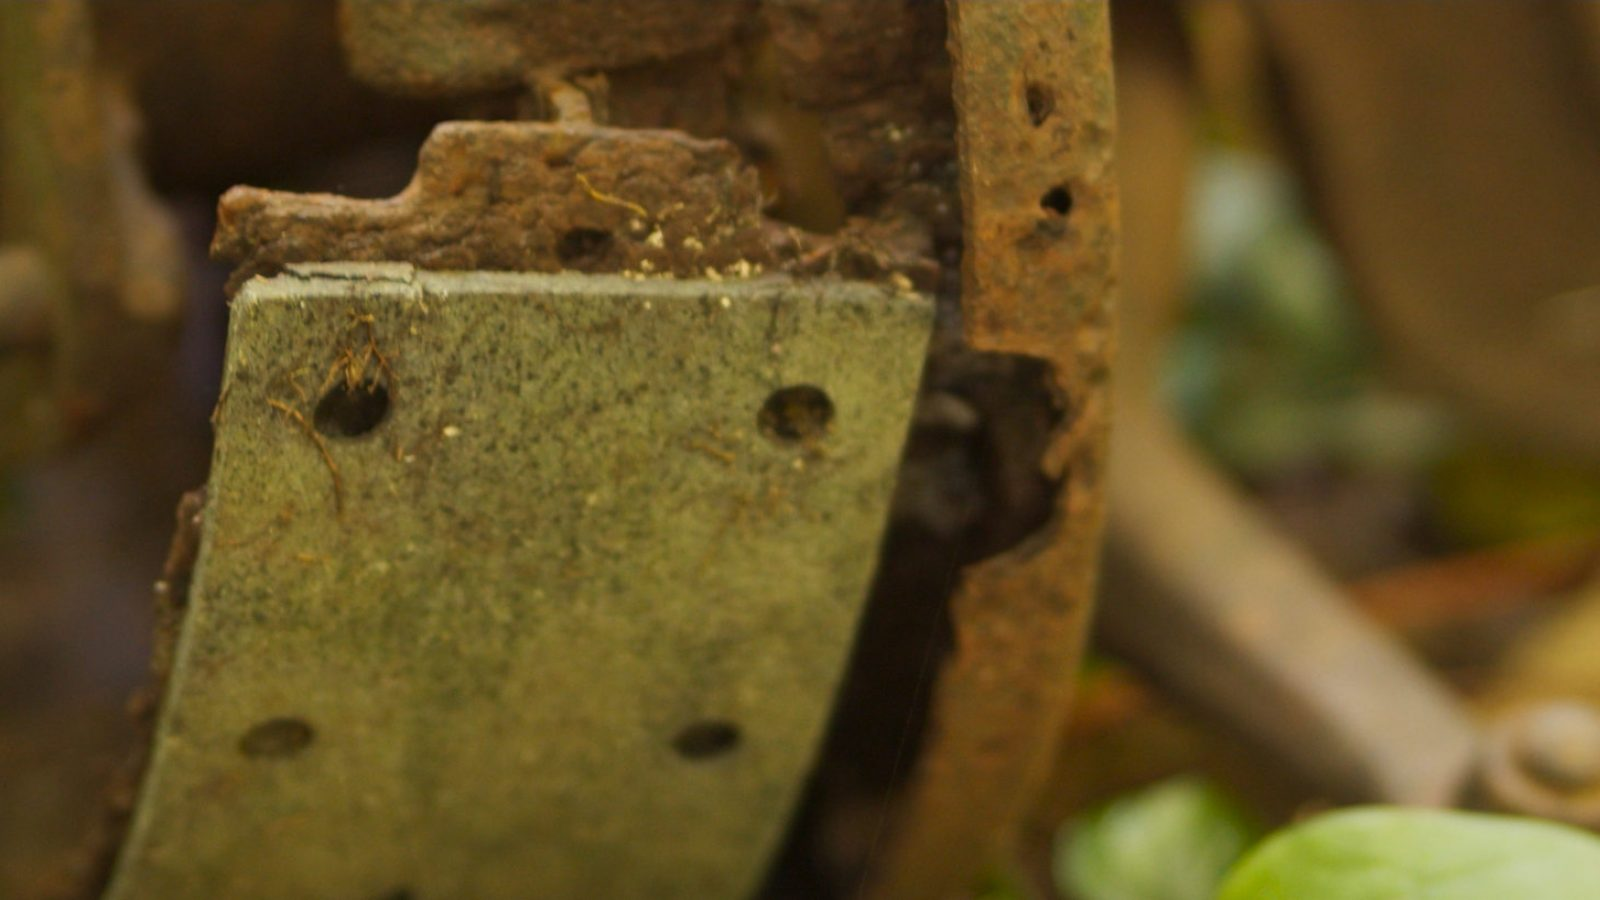 Still from Matthias' Lockdown Adventure car ruins in forest